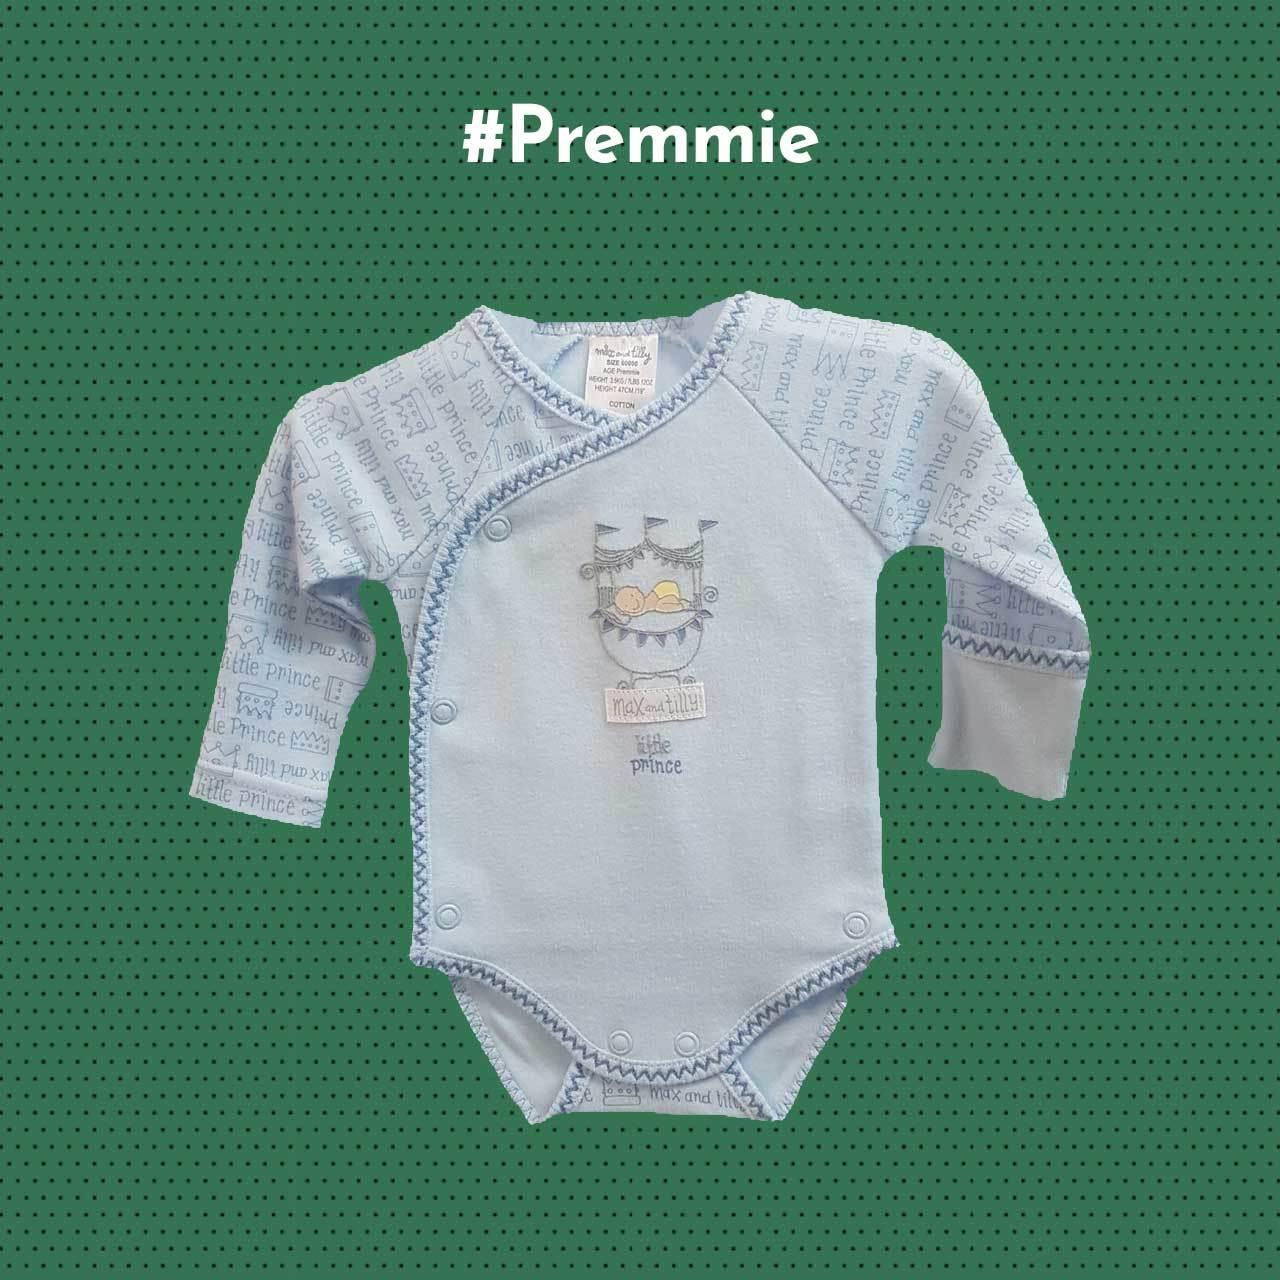 Premmie babies